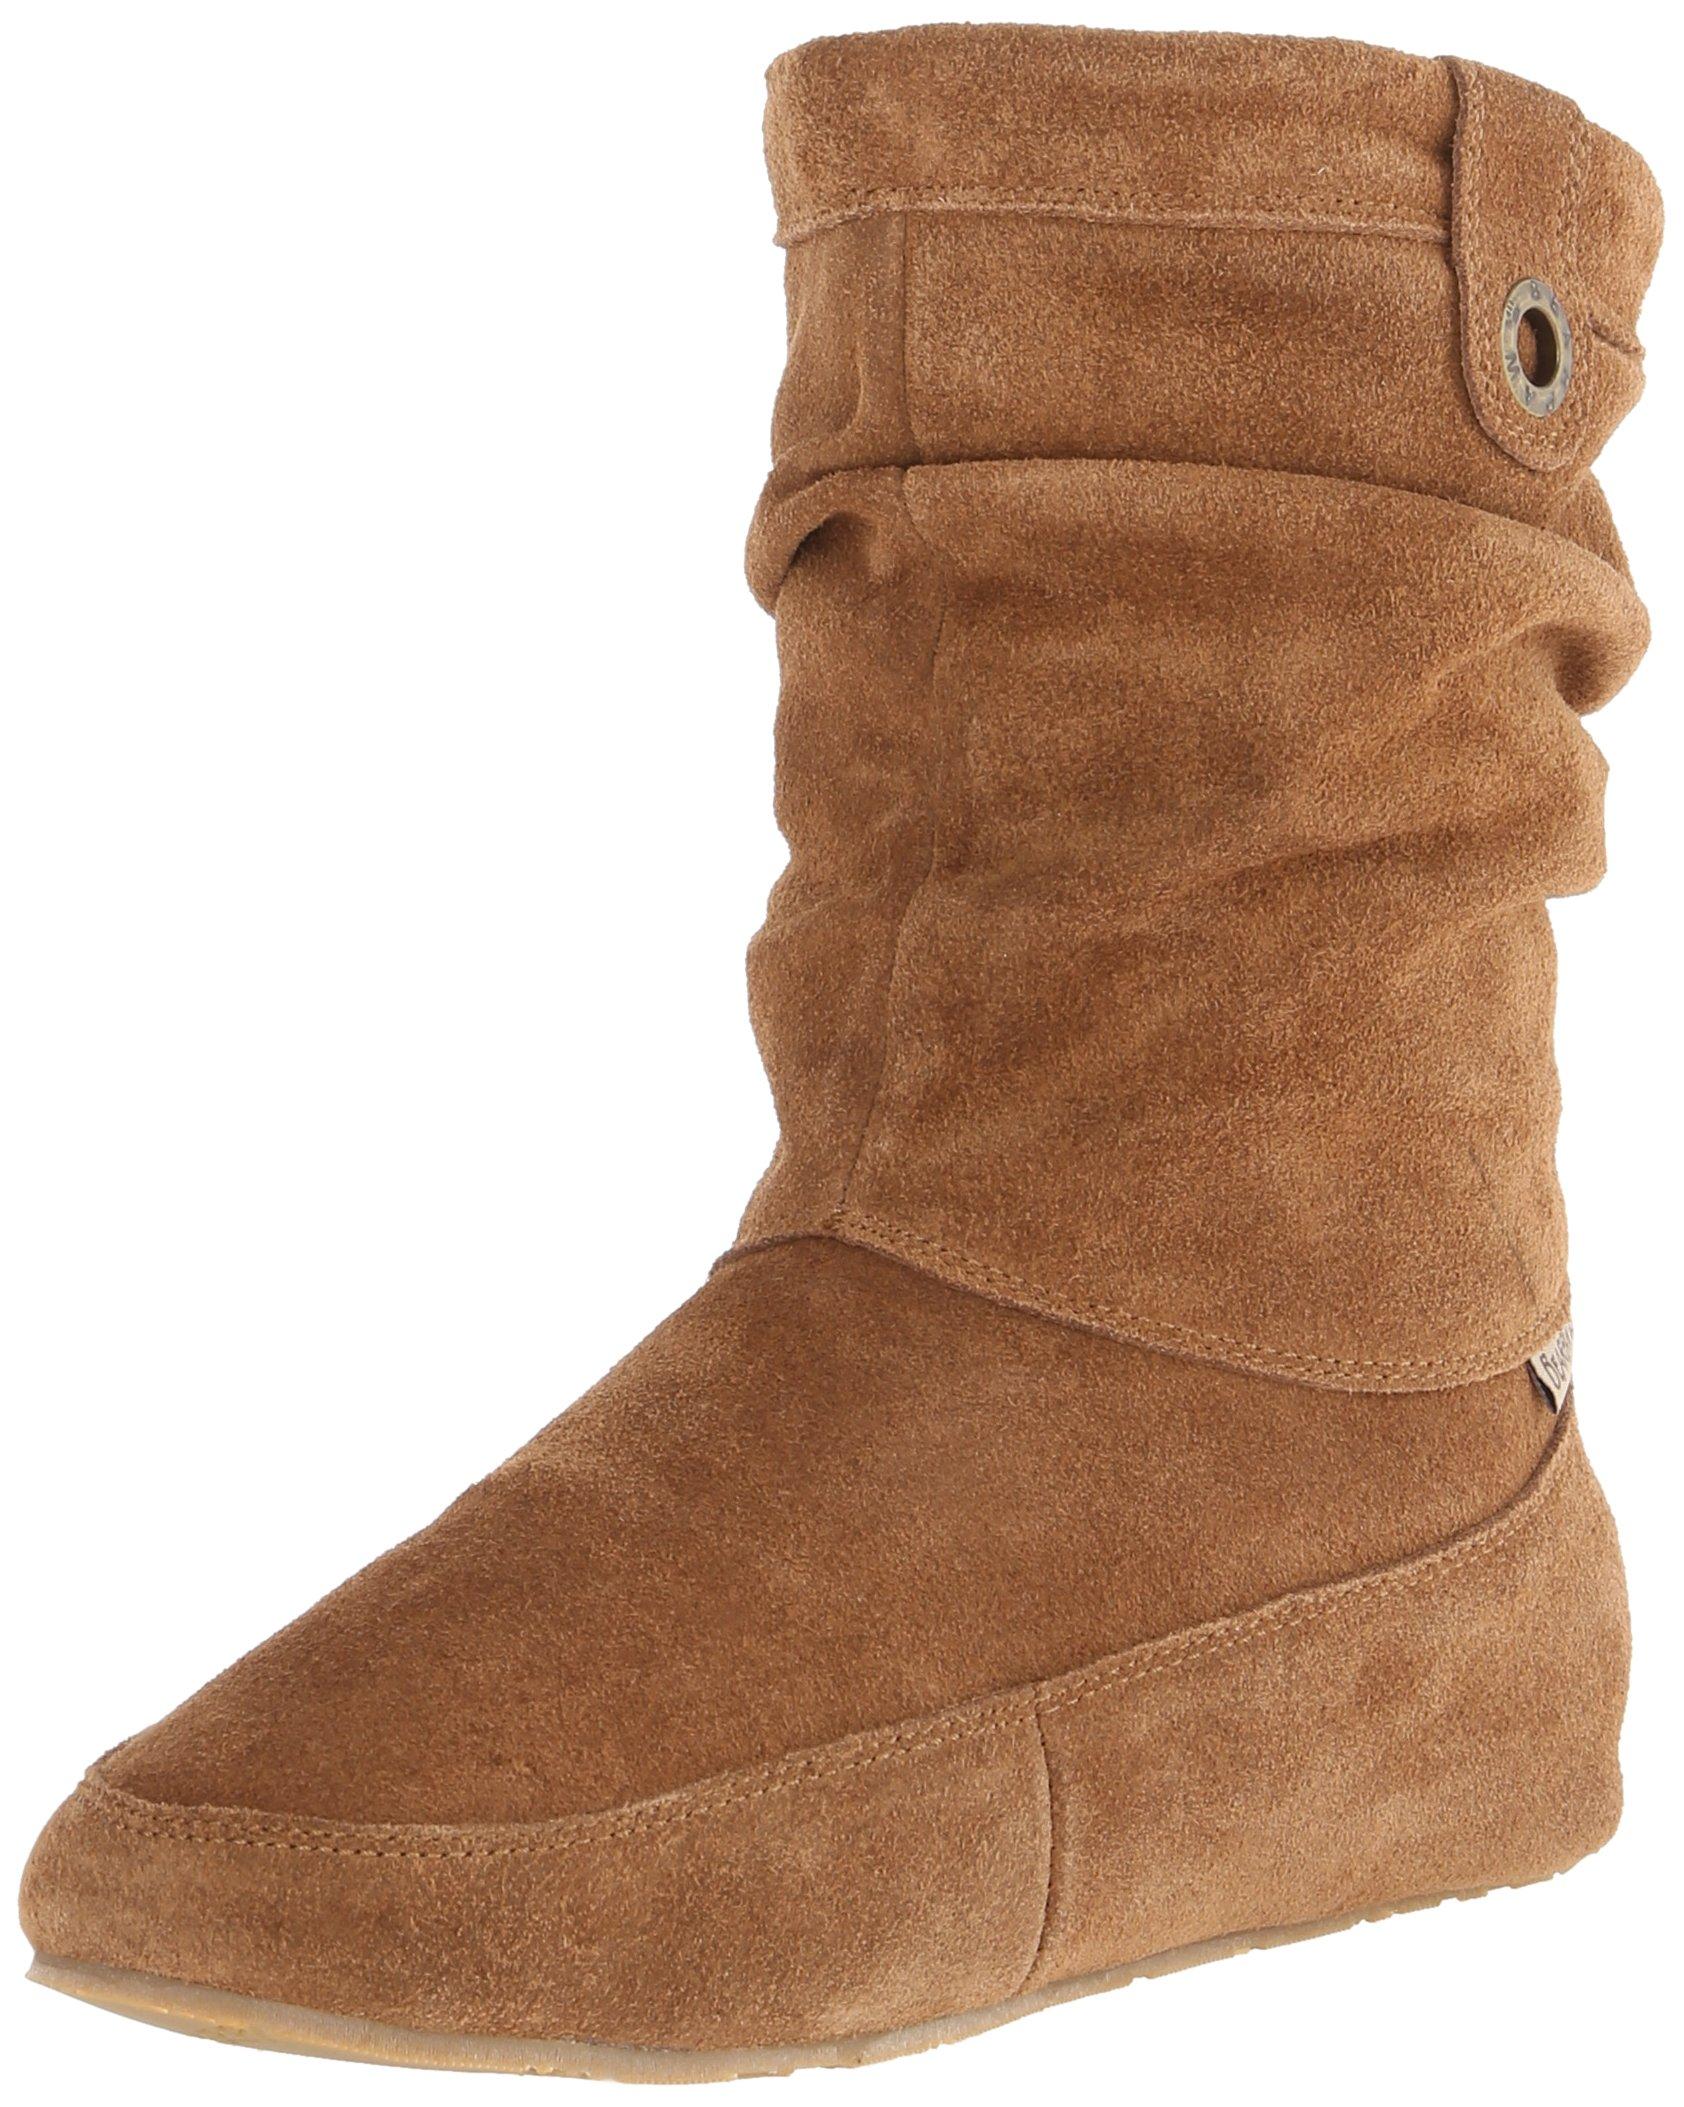 BEARPAW Women's Travel Snow Boot, Brown Suede, Sheepskin, 7 M